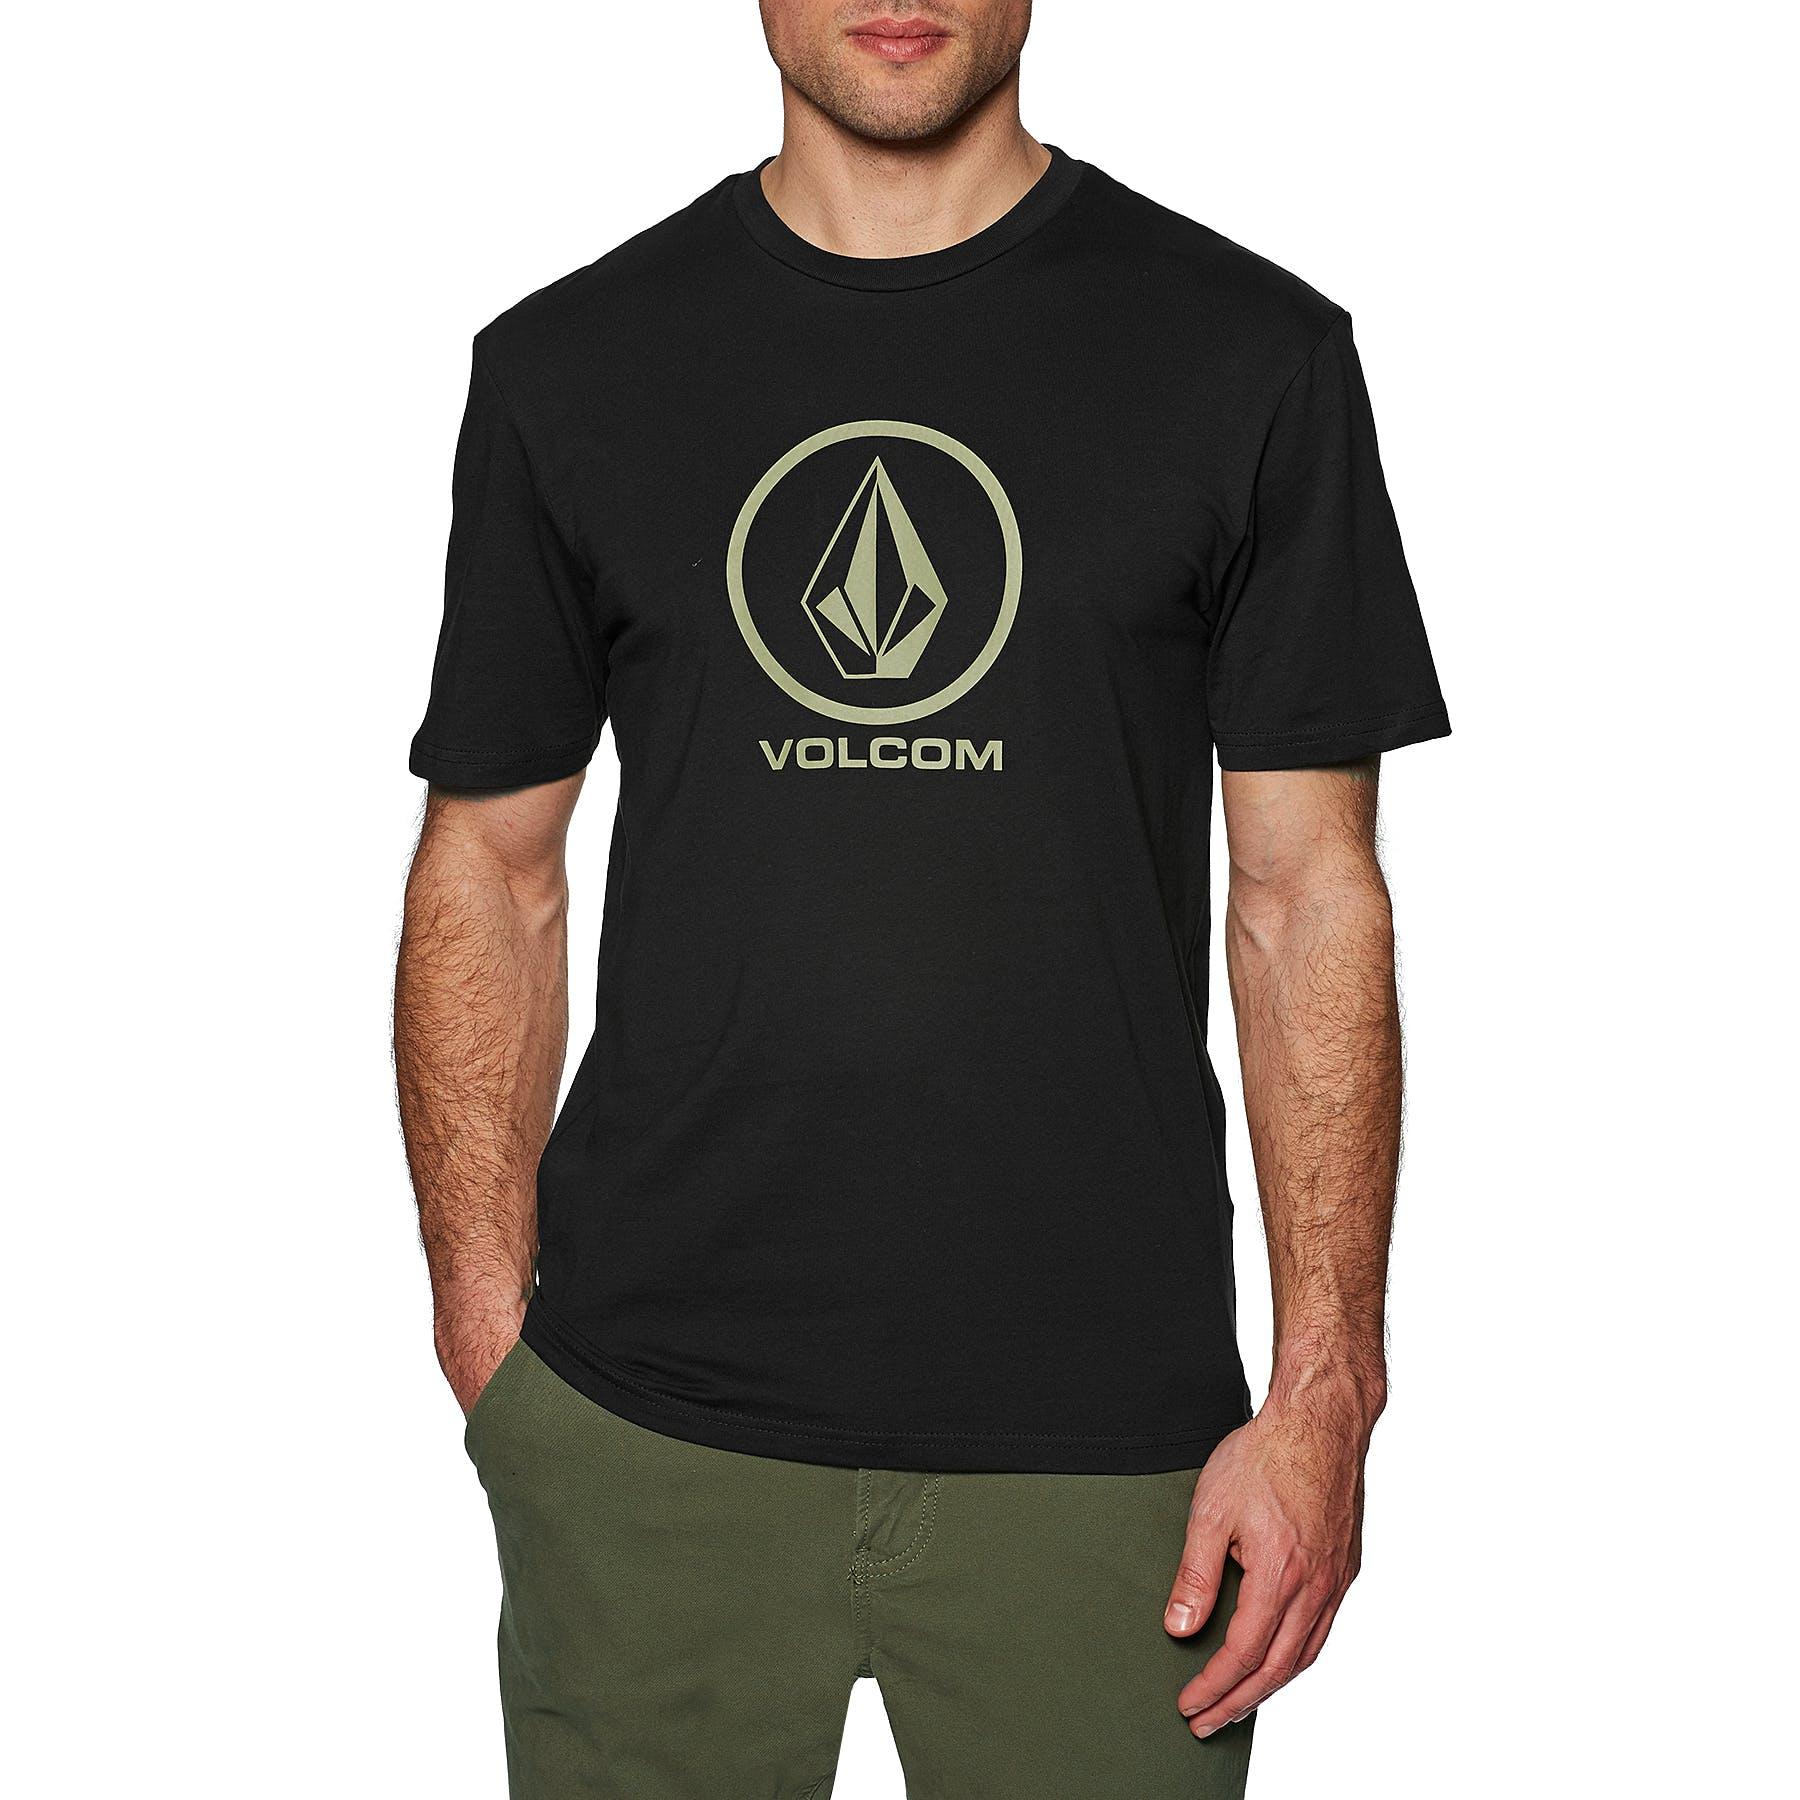 Details about  /Funny Novelty T-Shirt Mens tee TShirt Its A Tea Shirt